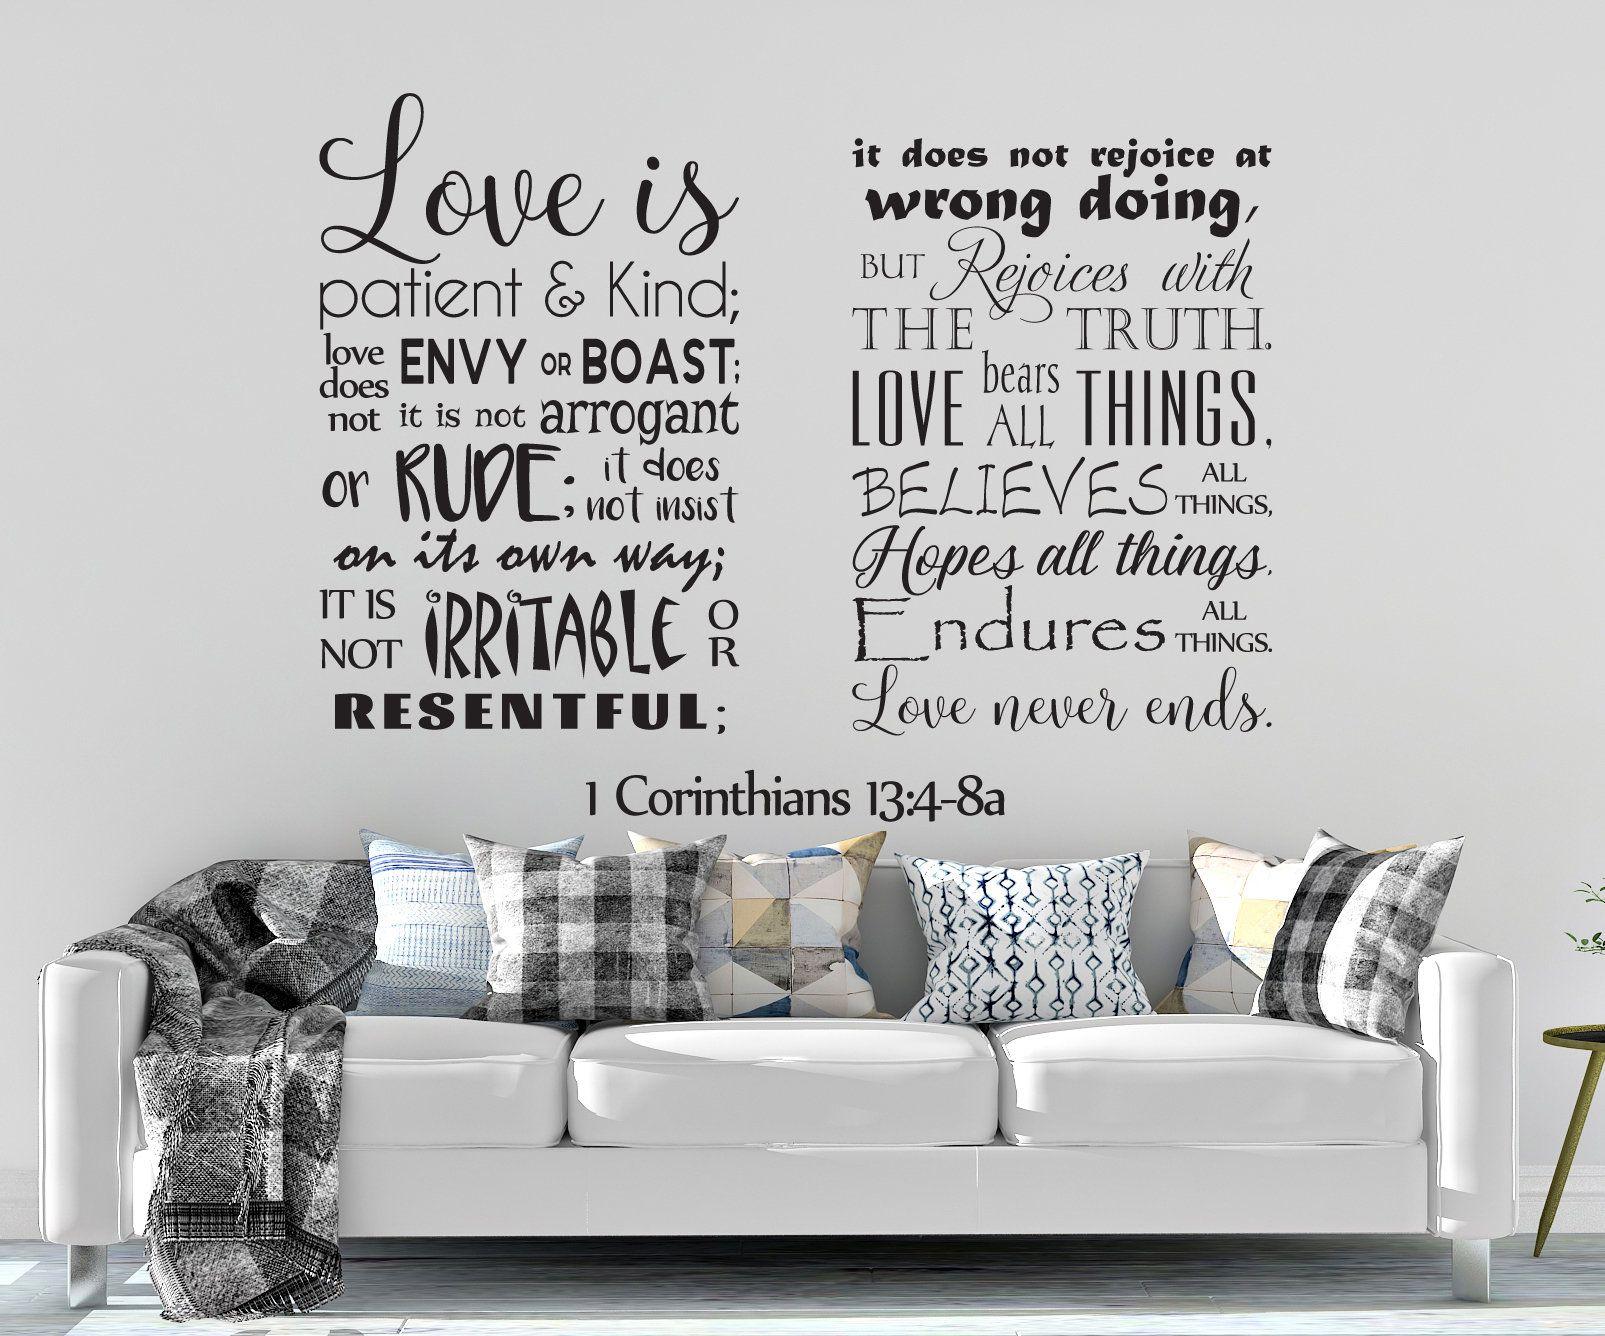 Vinyl Wall Decal 1 Corinthians 13 4 8 Love Is Etsy Vinyl Wall Decals Love Does Not Envy Wall Decals